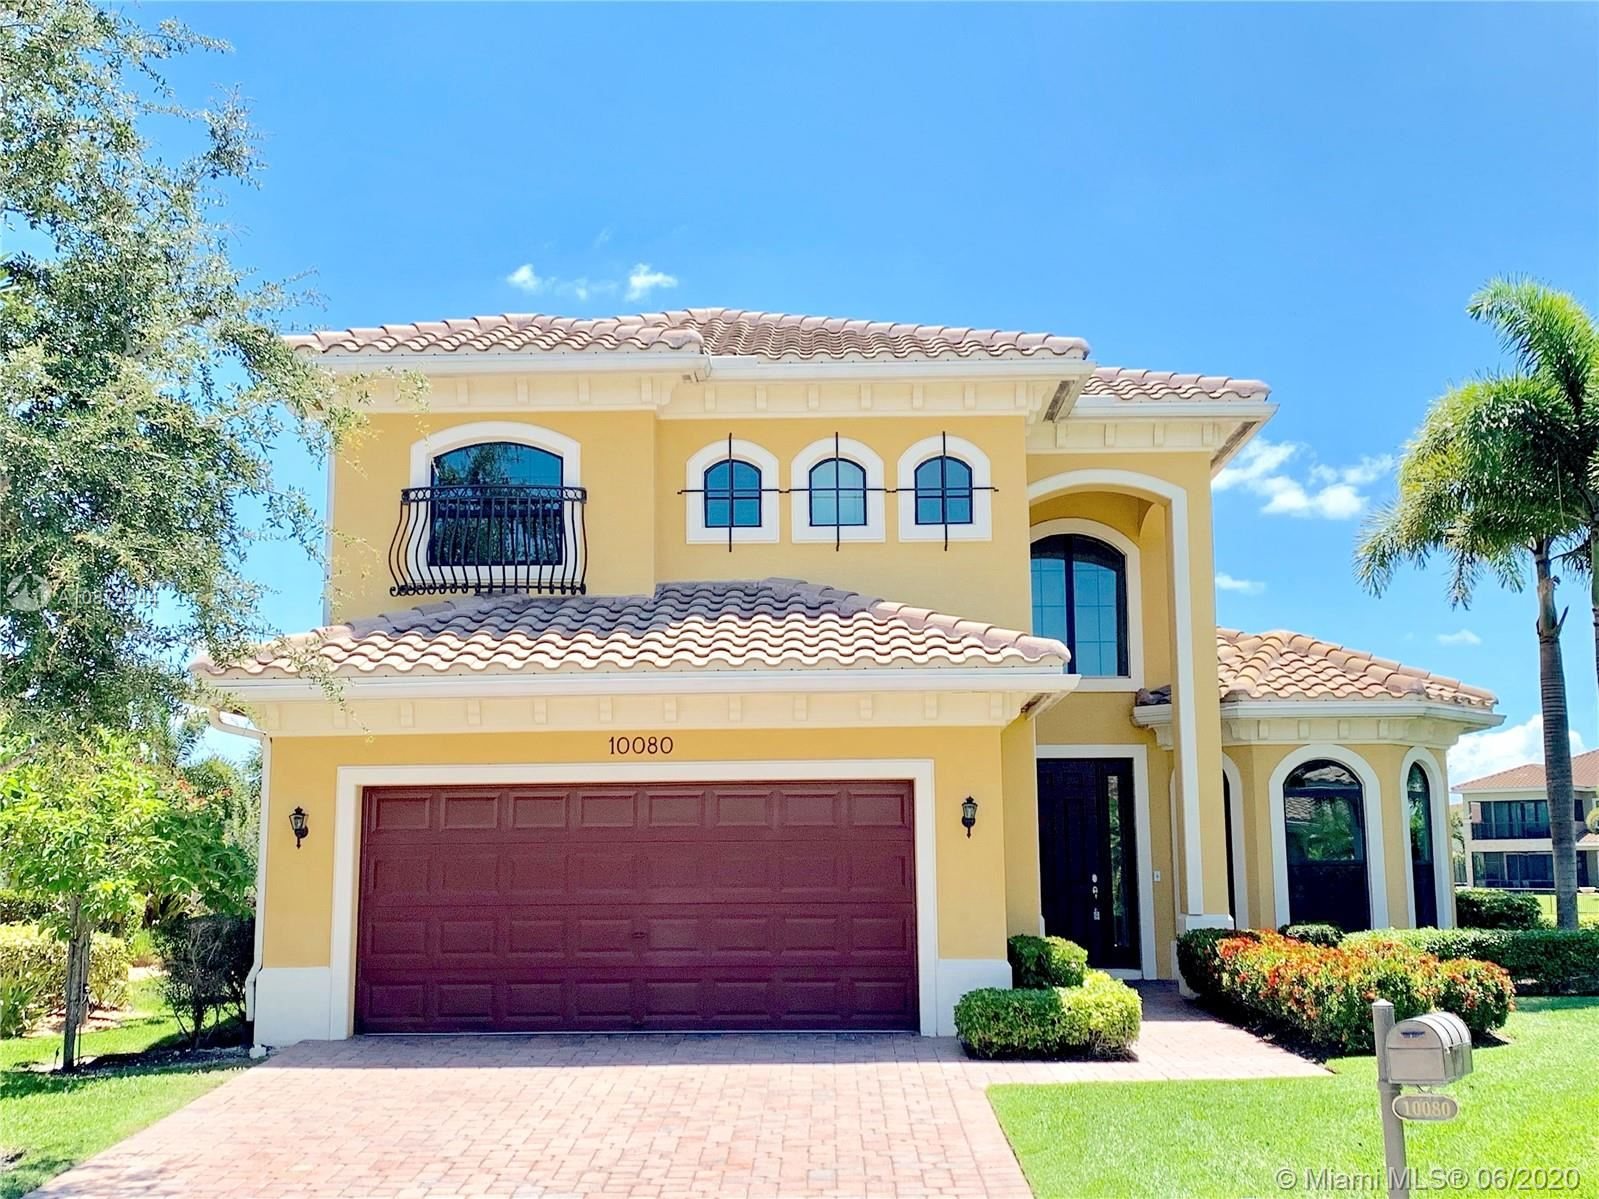 10080 Cameilla St, Parkland, FL 33076 - #: A10873844